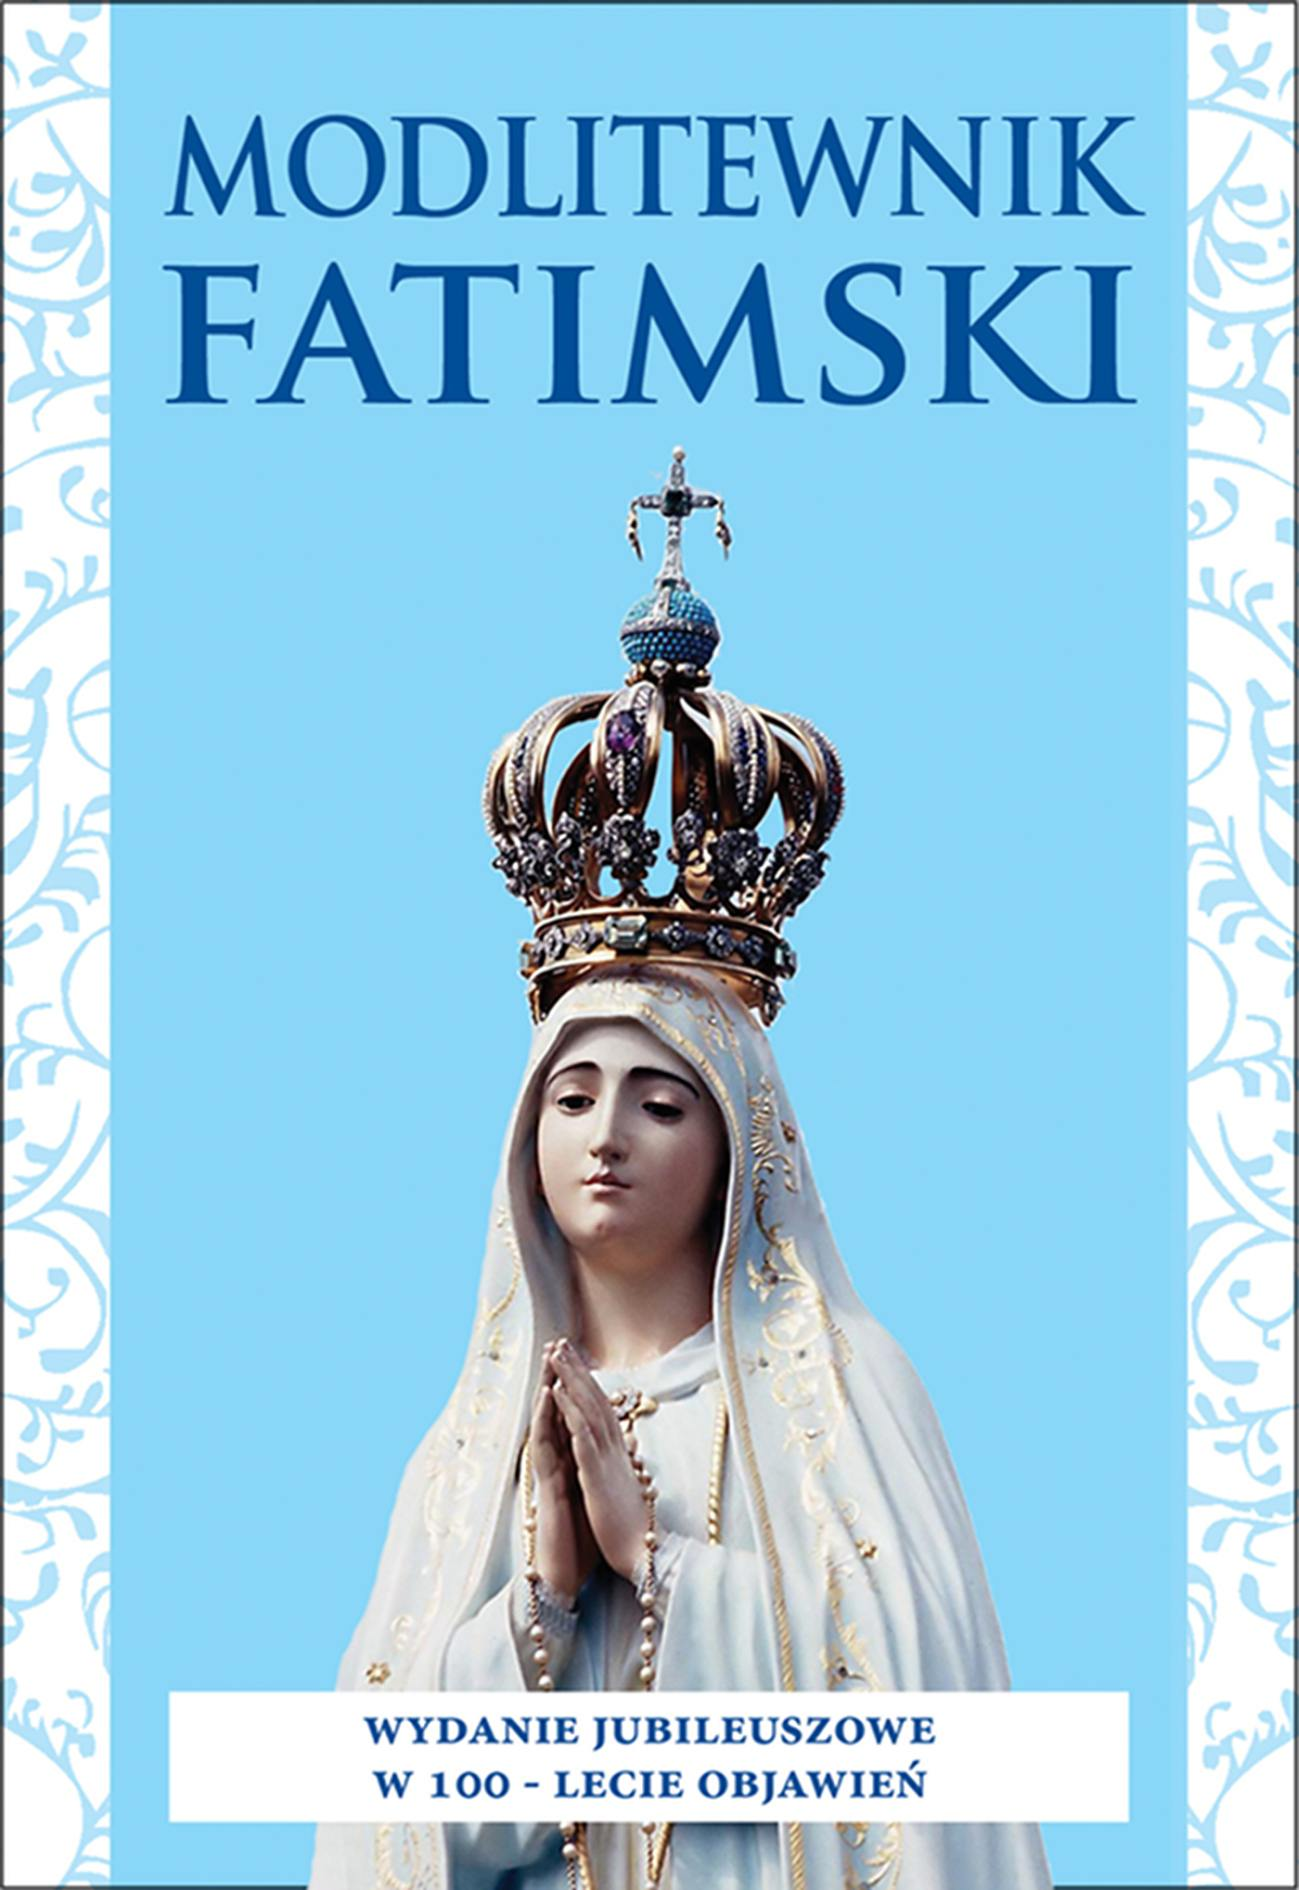 Modlitewnik fatimski - Ebook (Książka na Kindle) do pobrania w formacie MOBI